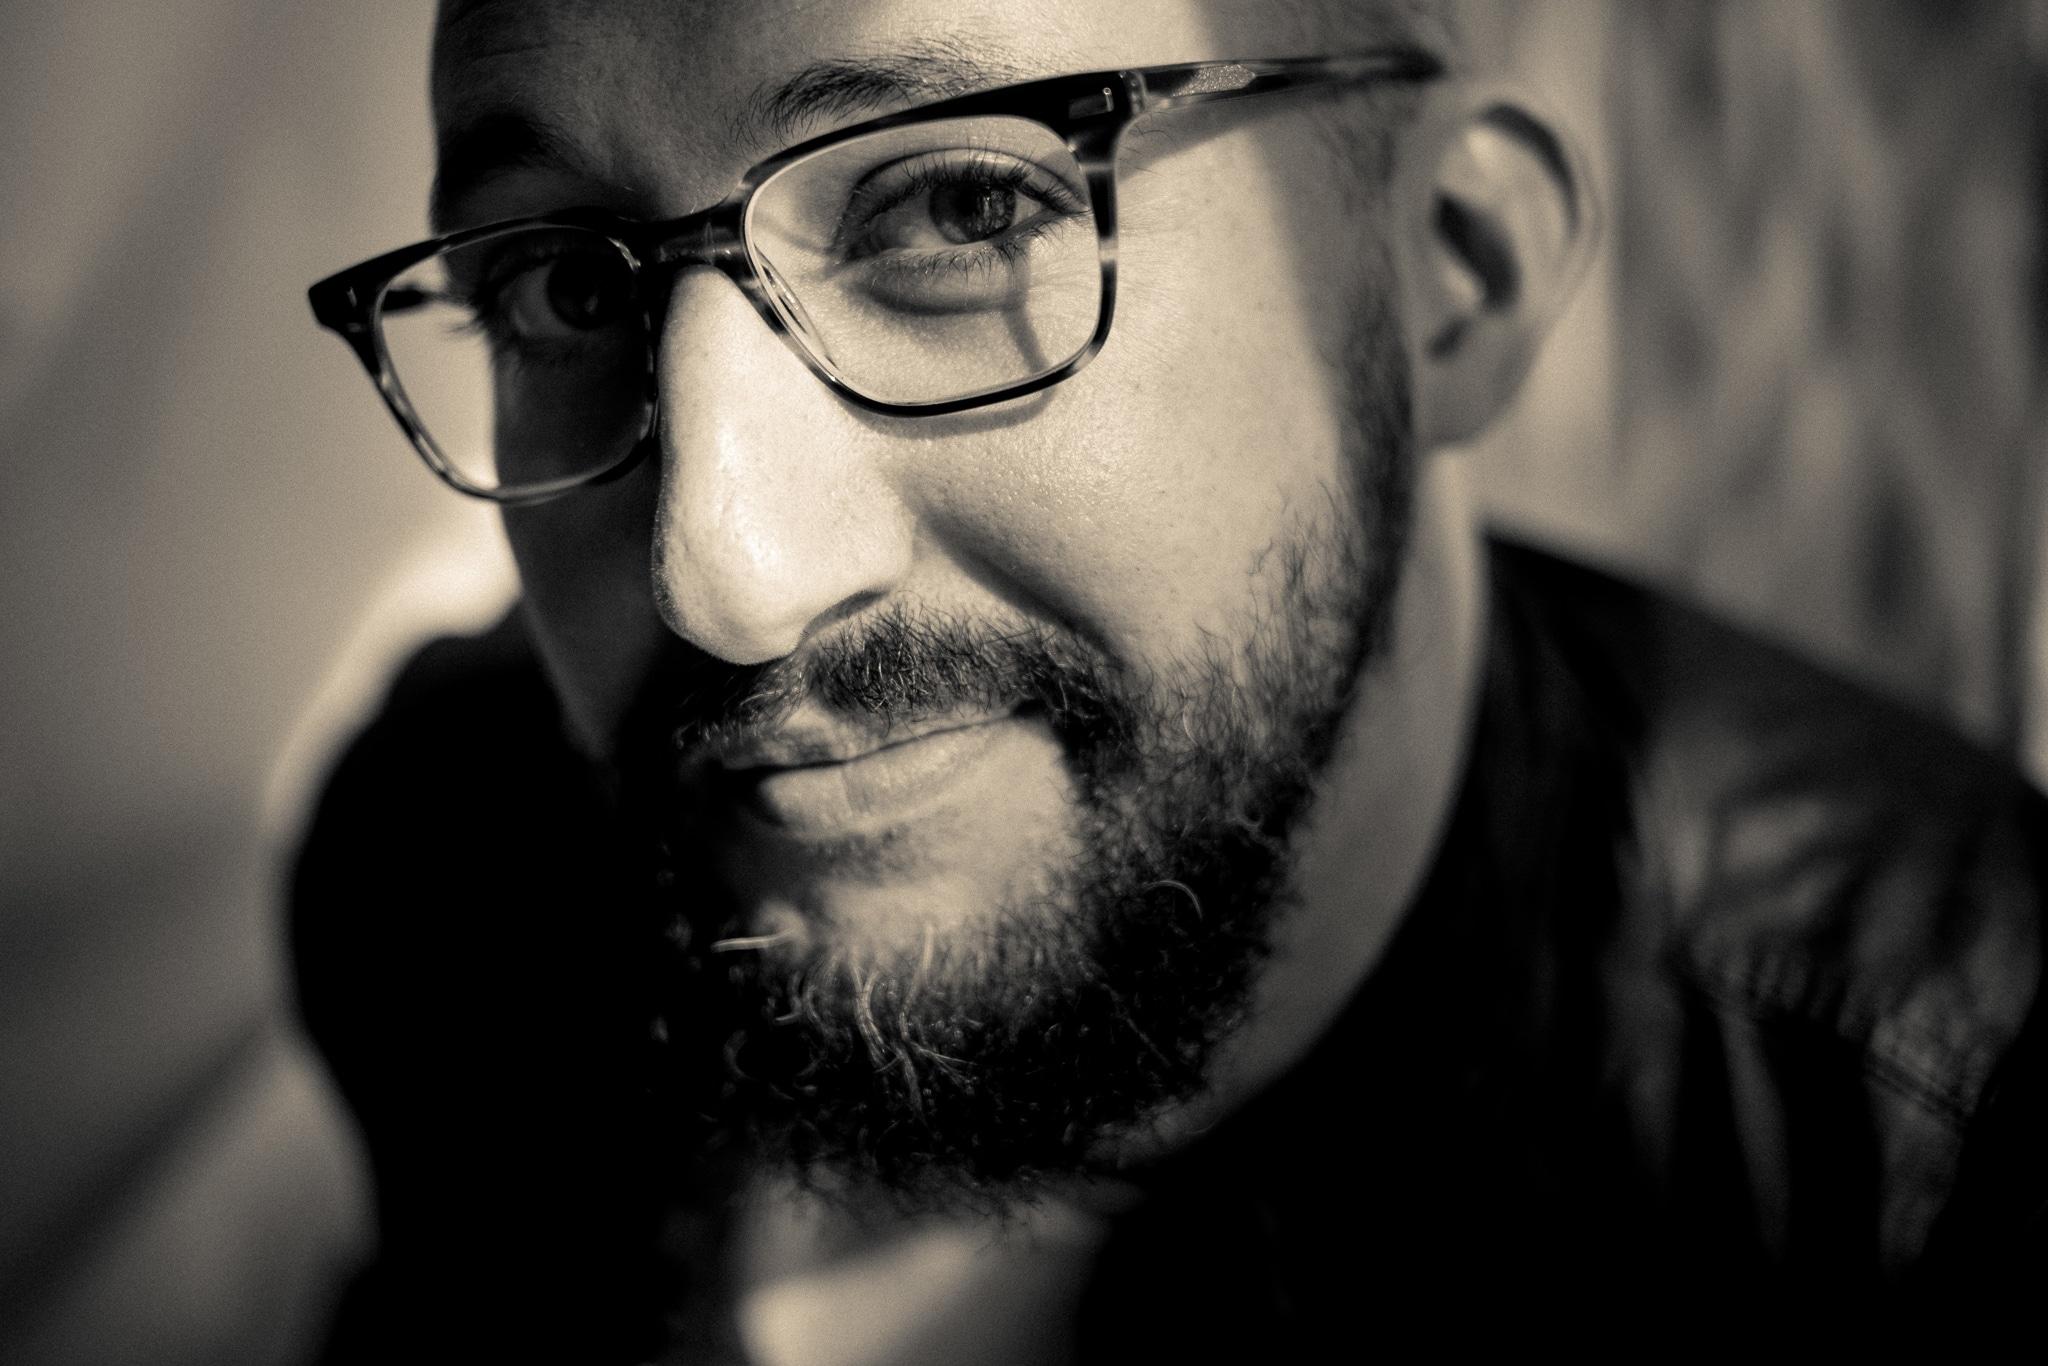 Matt closeup  with glasses